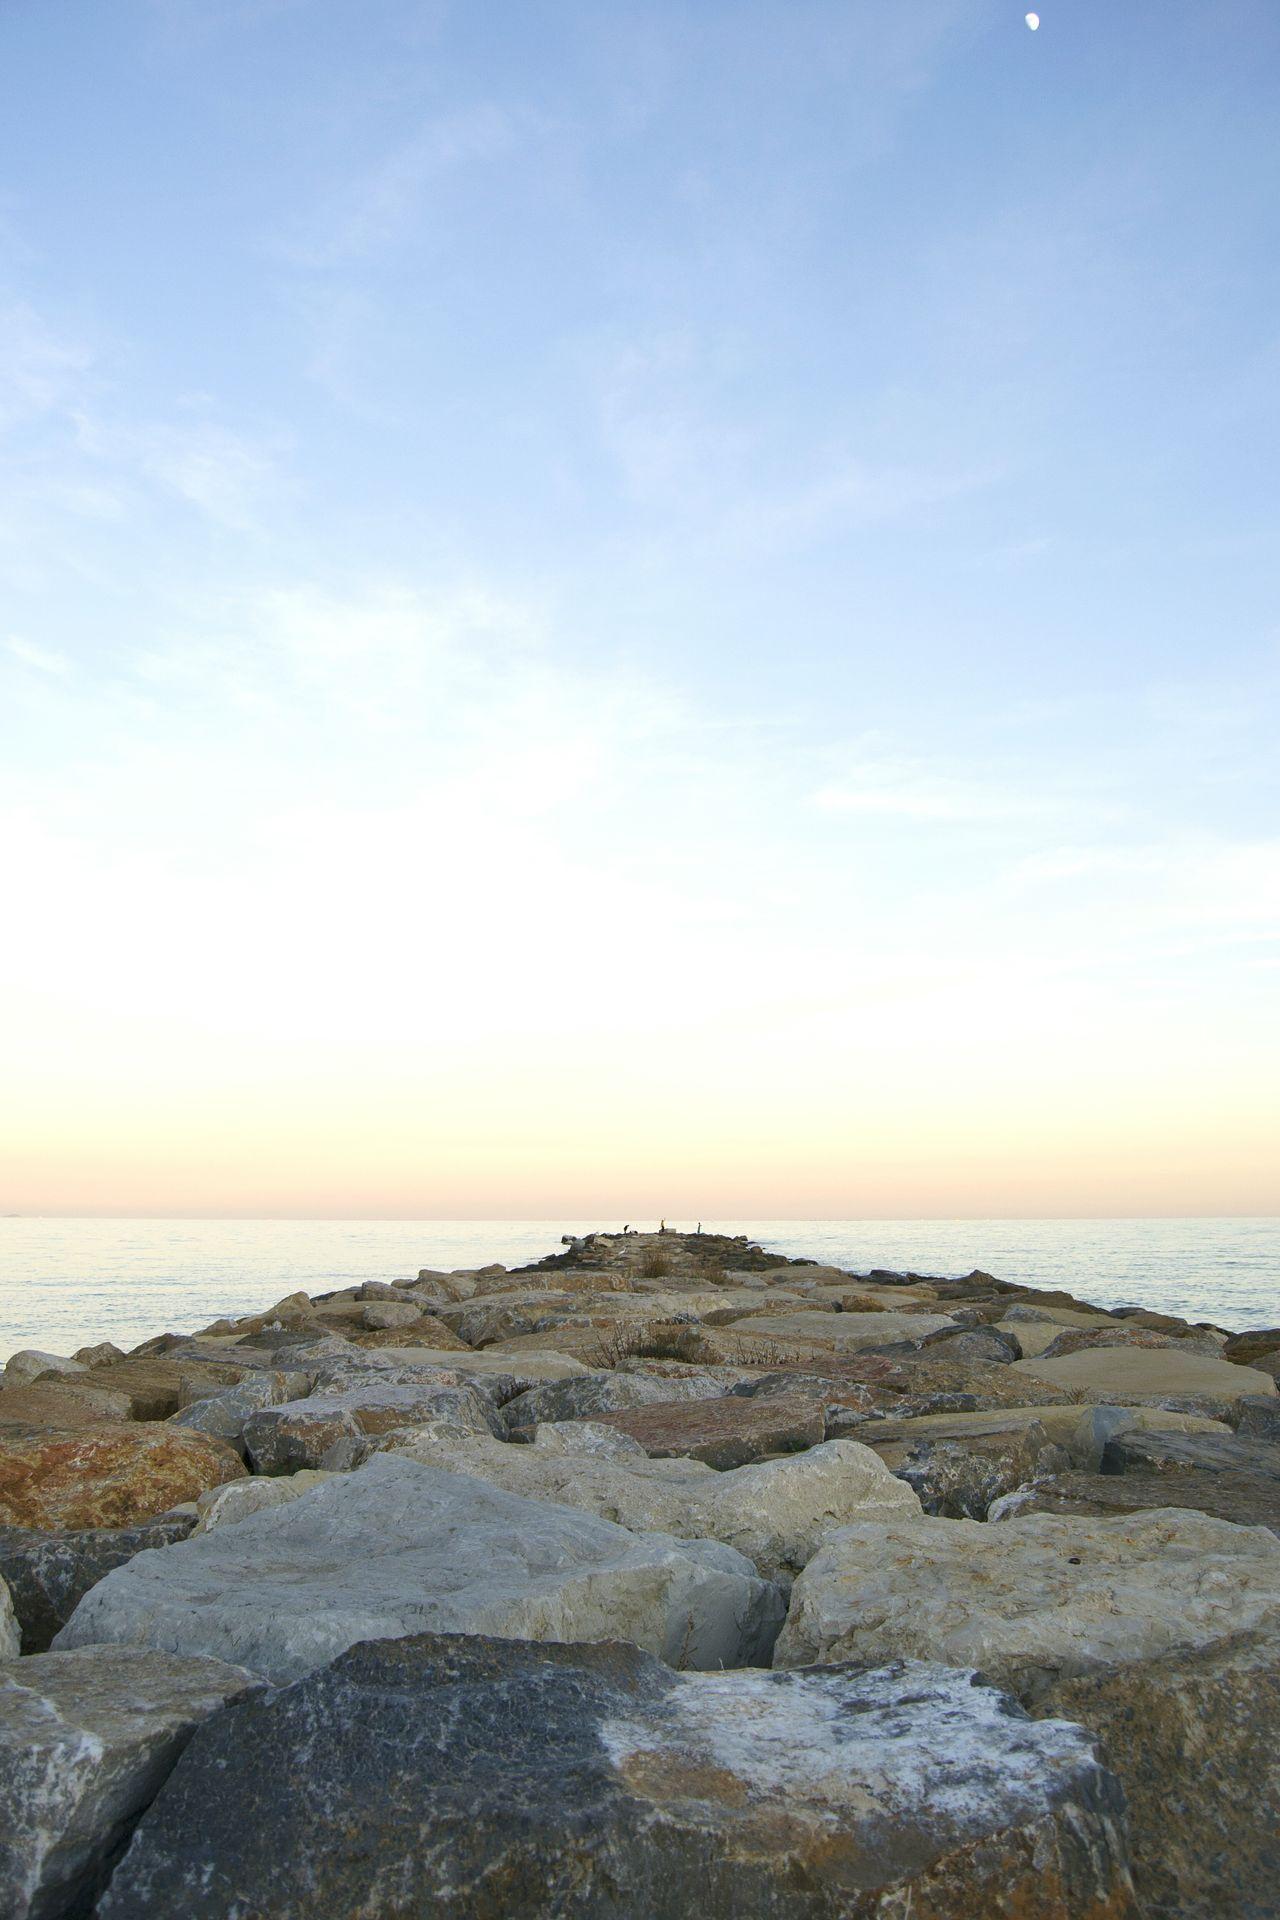 Espigon Beach Beachphotography Relaxing El Campello Alicante, Spain Alicante Sea Sea And Sky Seaside Seascape Sea View Fisherman Sunset Sunset_collection Perspective Point Of View Stones Stonestructures Far Horizon Over Water Horizon Calm Calm Sea Stones & Water